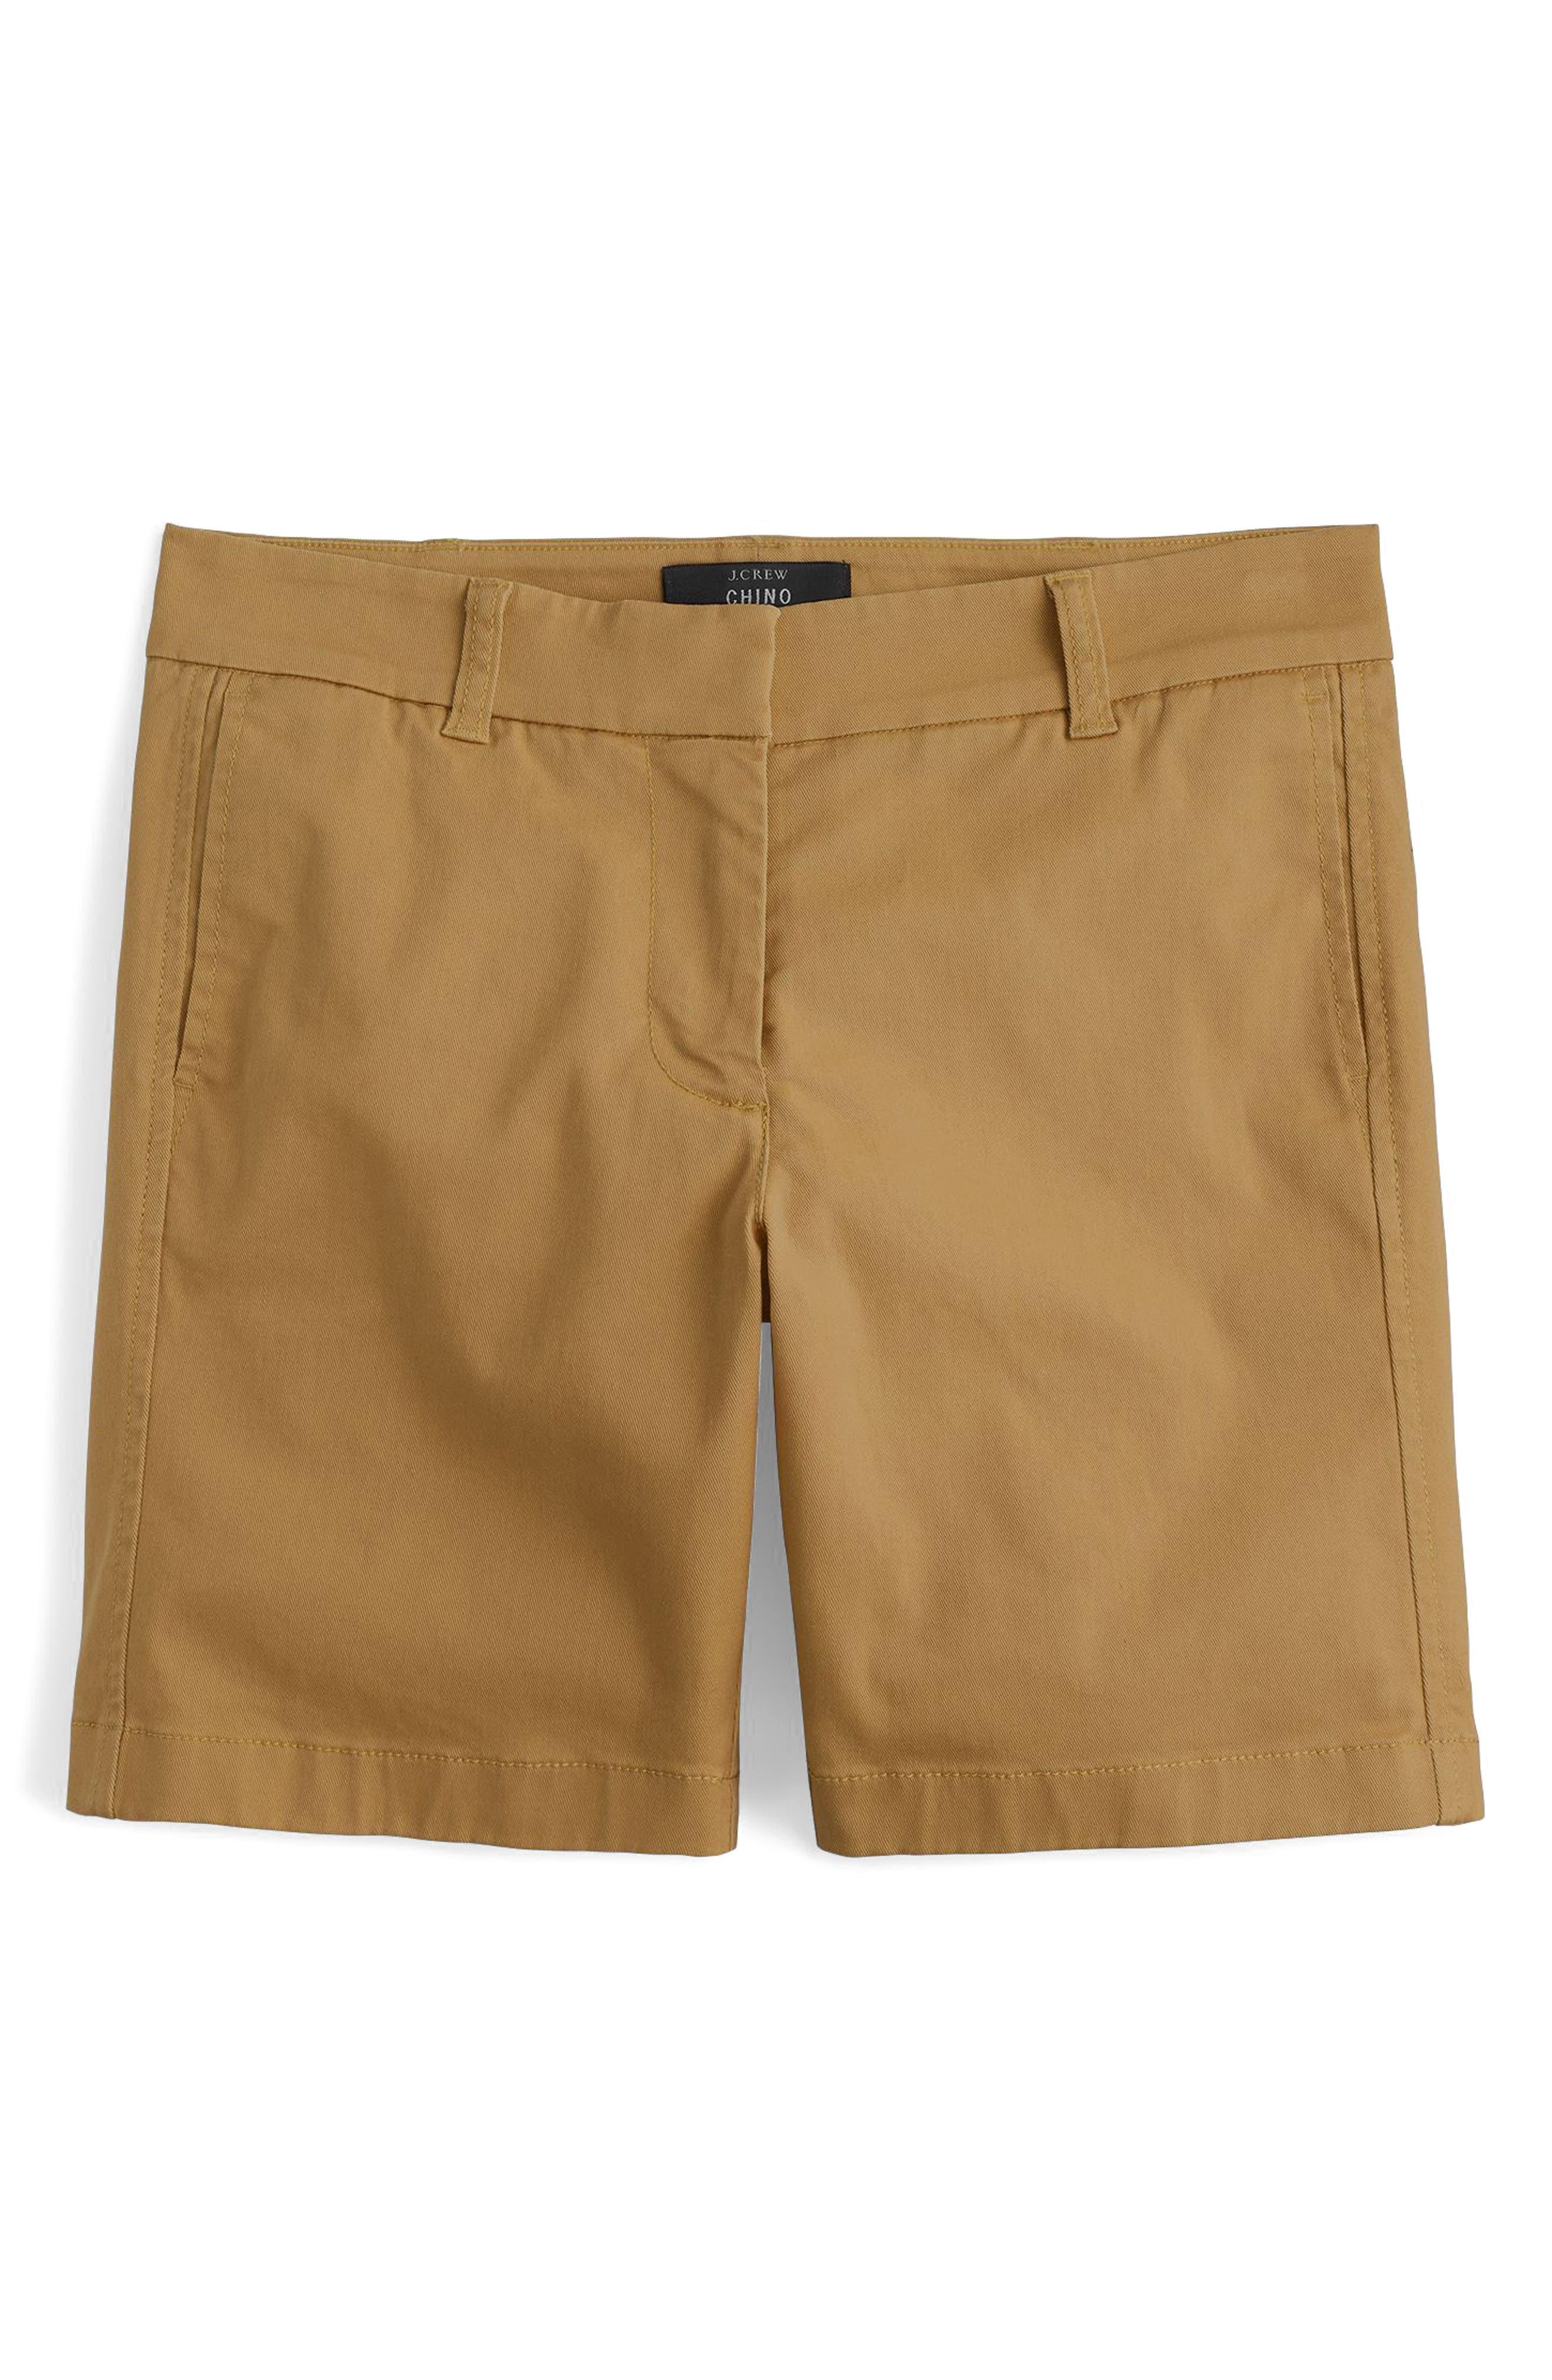 J.Crew Stretch Cotton Chino Shorts